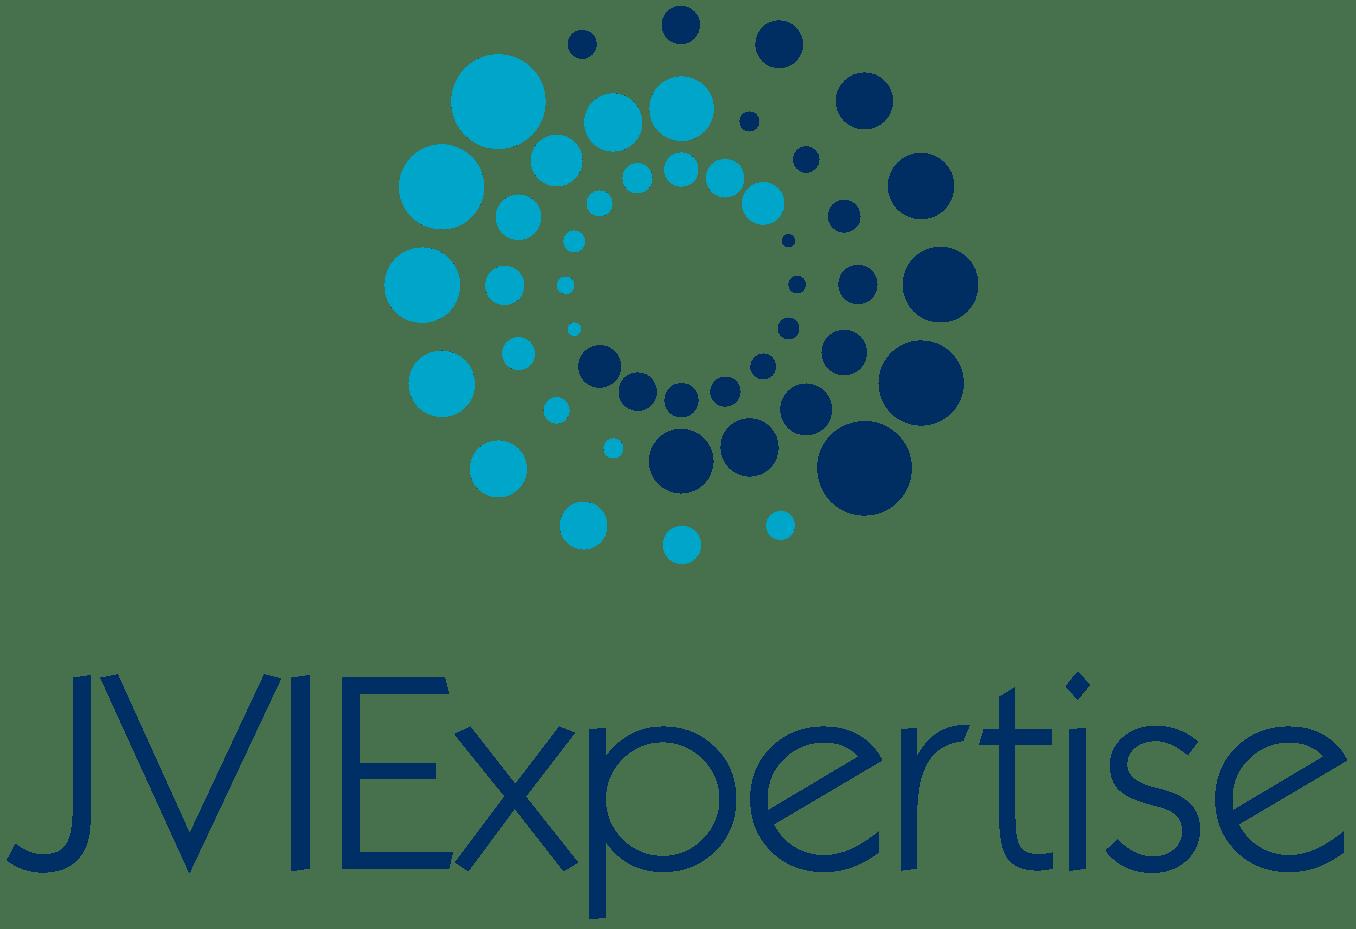 JVIExpertise